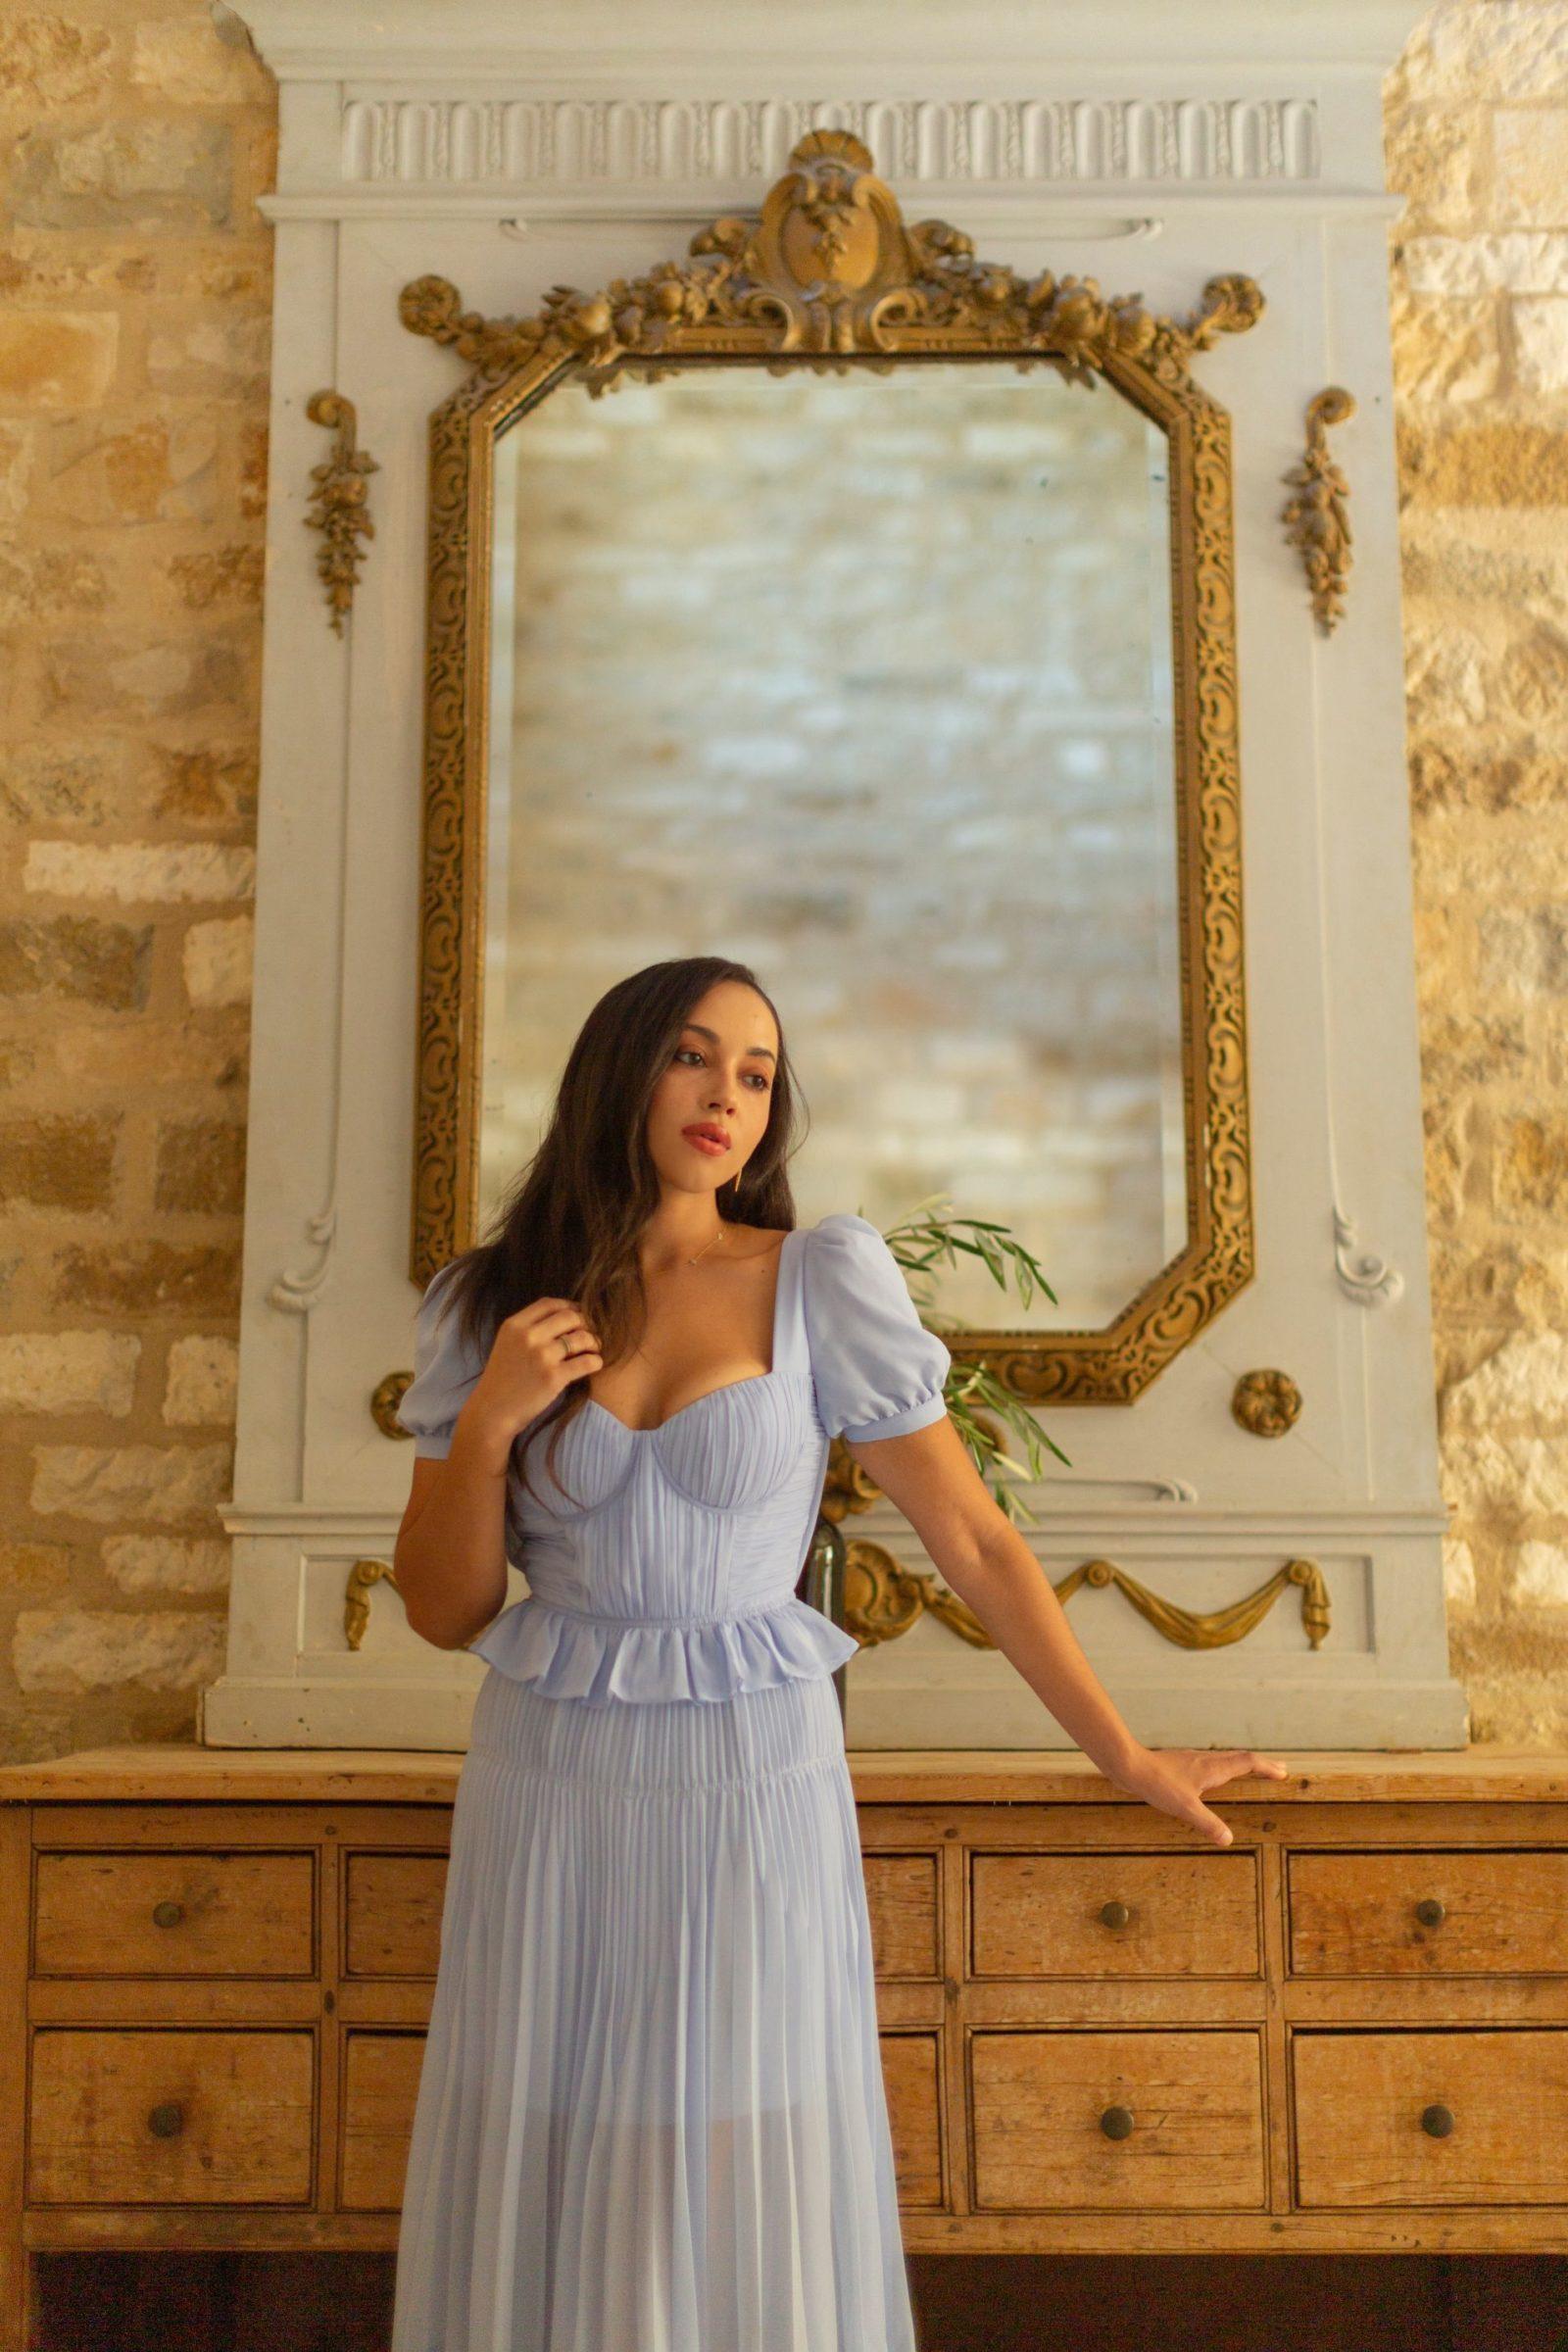 Miss-self-portrait-jewelry-tuscan-inspir